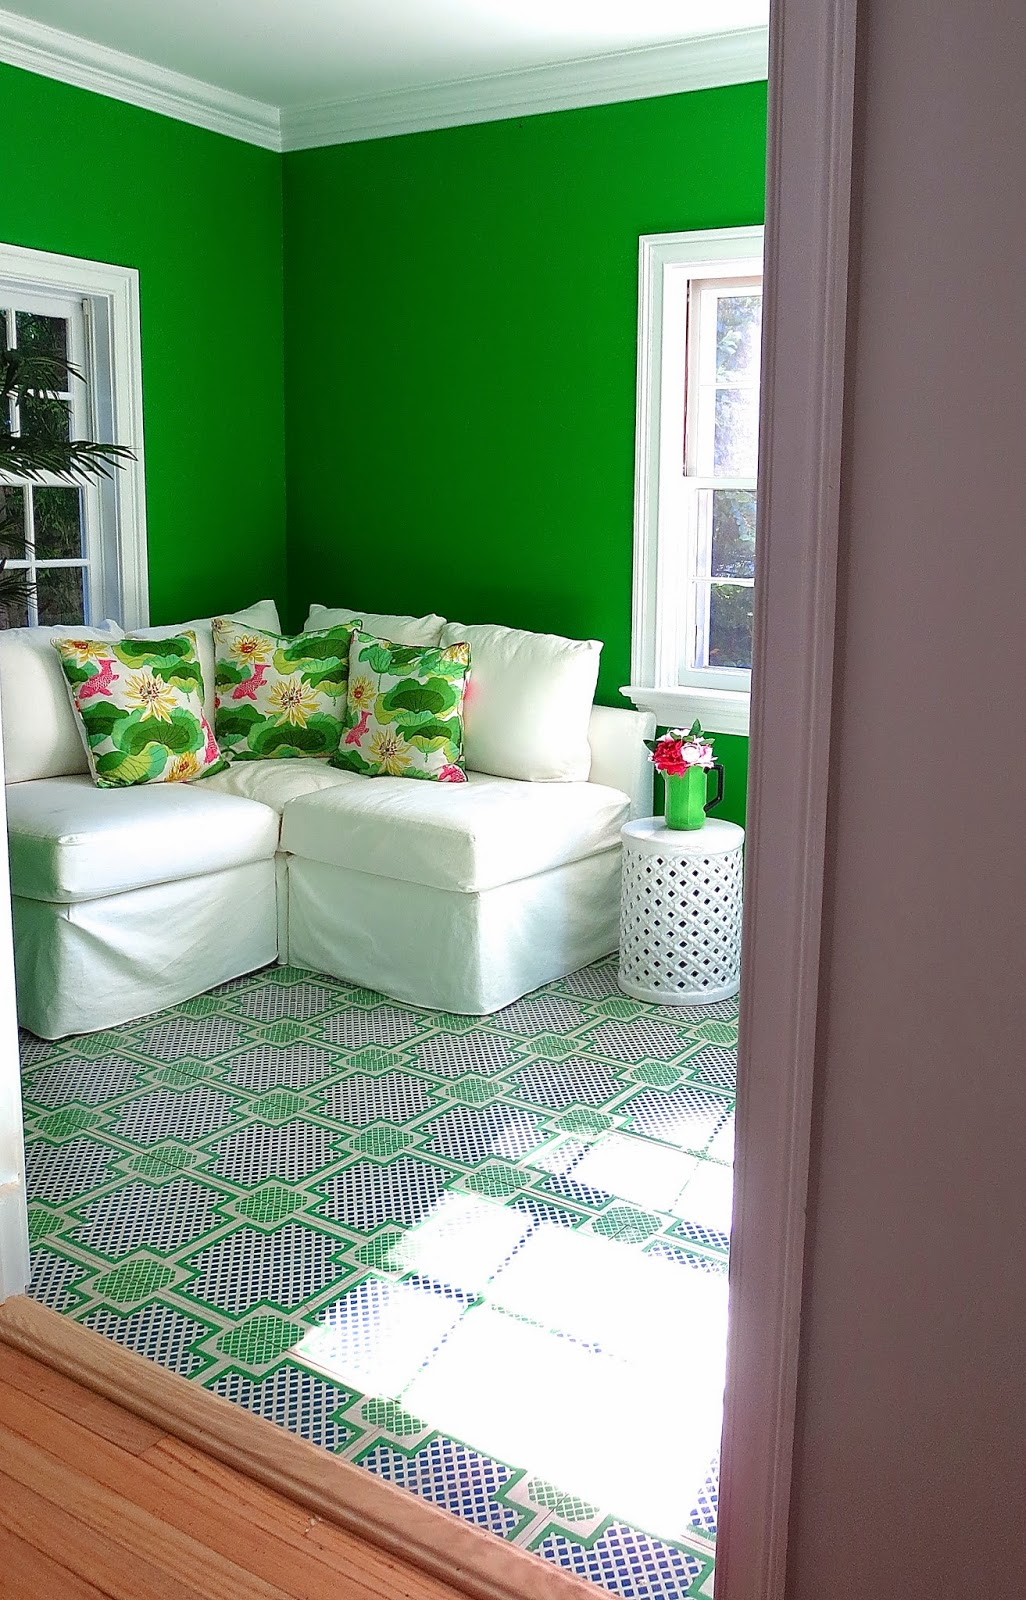 Cococozy am 39 s pretty little green room east hampton decor for Kelly green decor